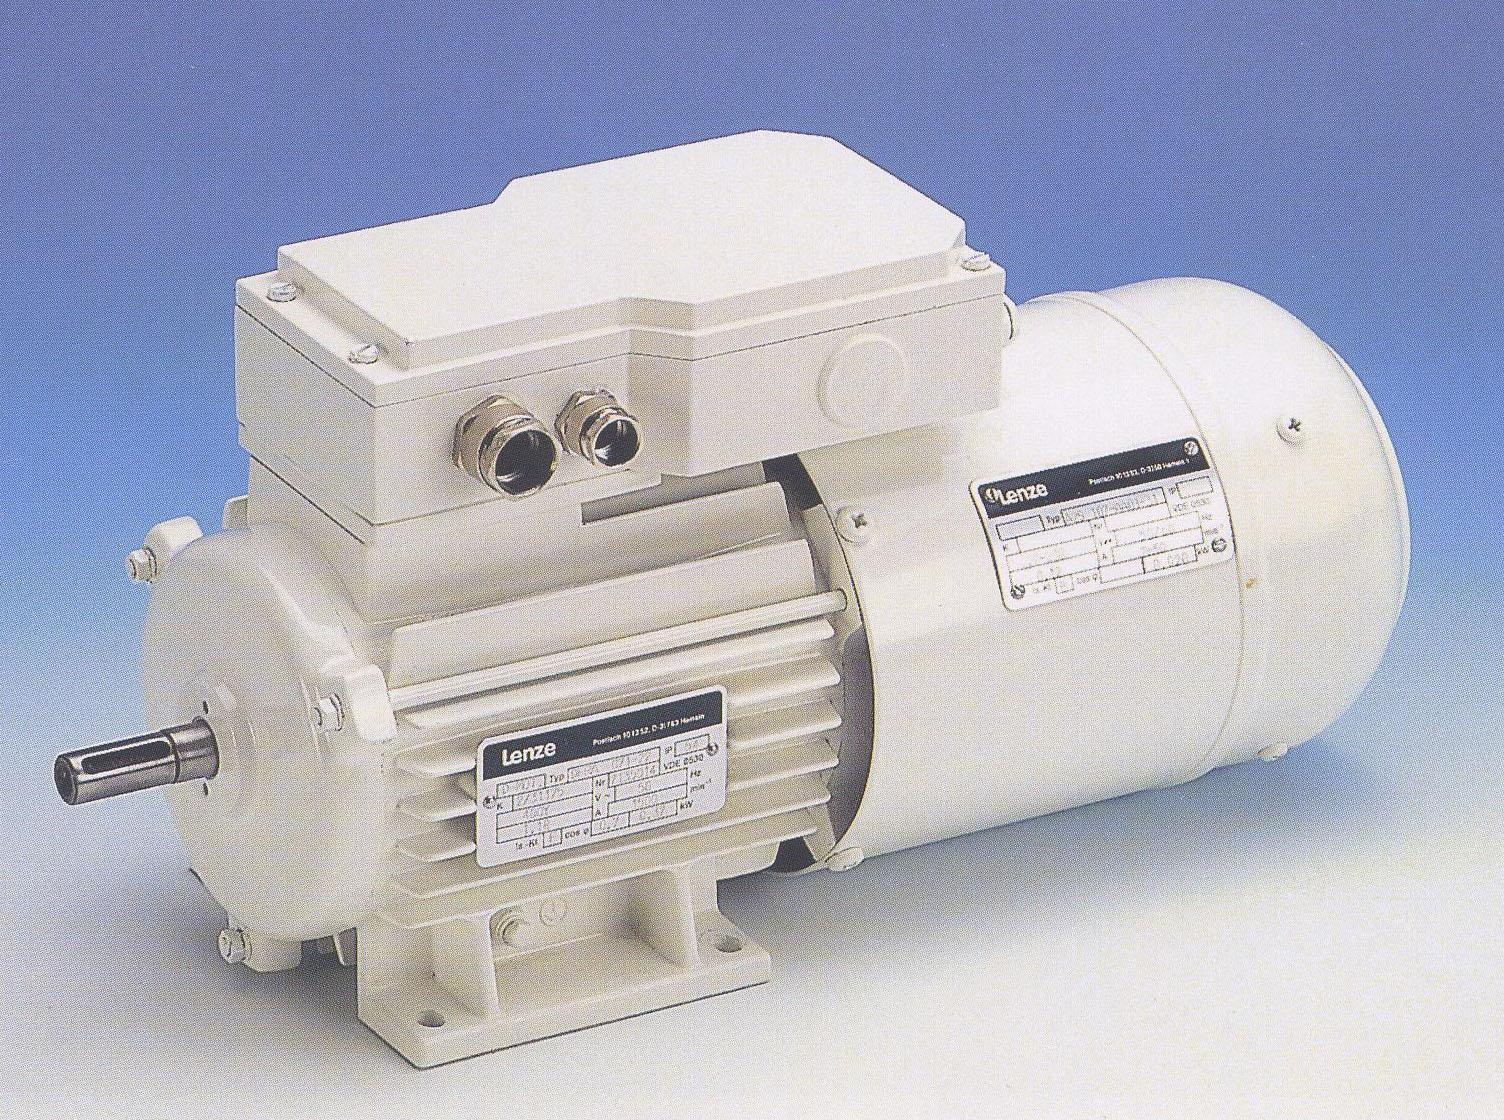 37.Асинхронний двигун з частотним керуванням